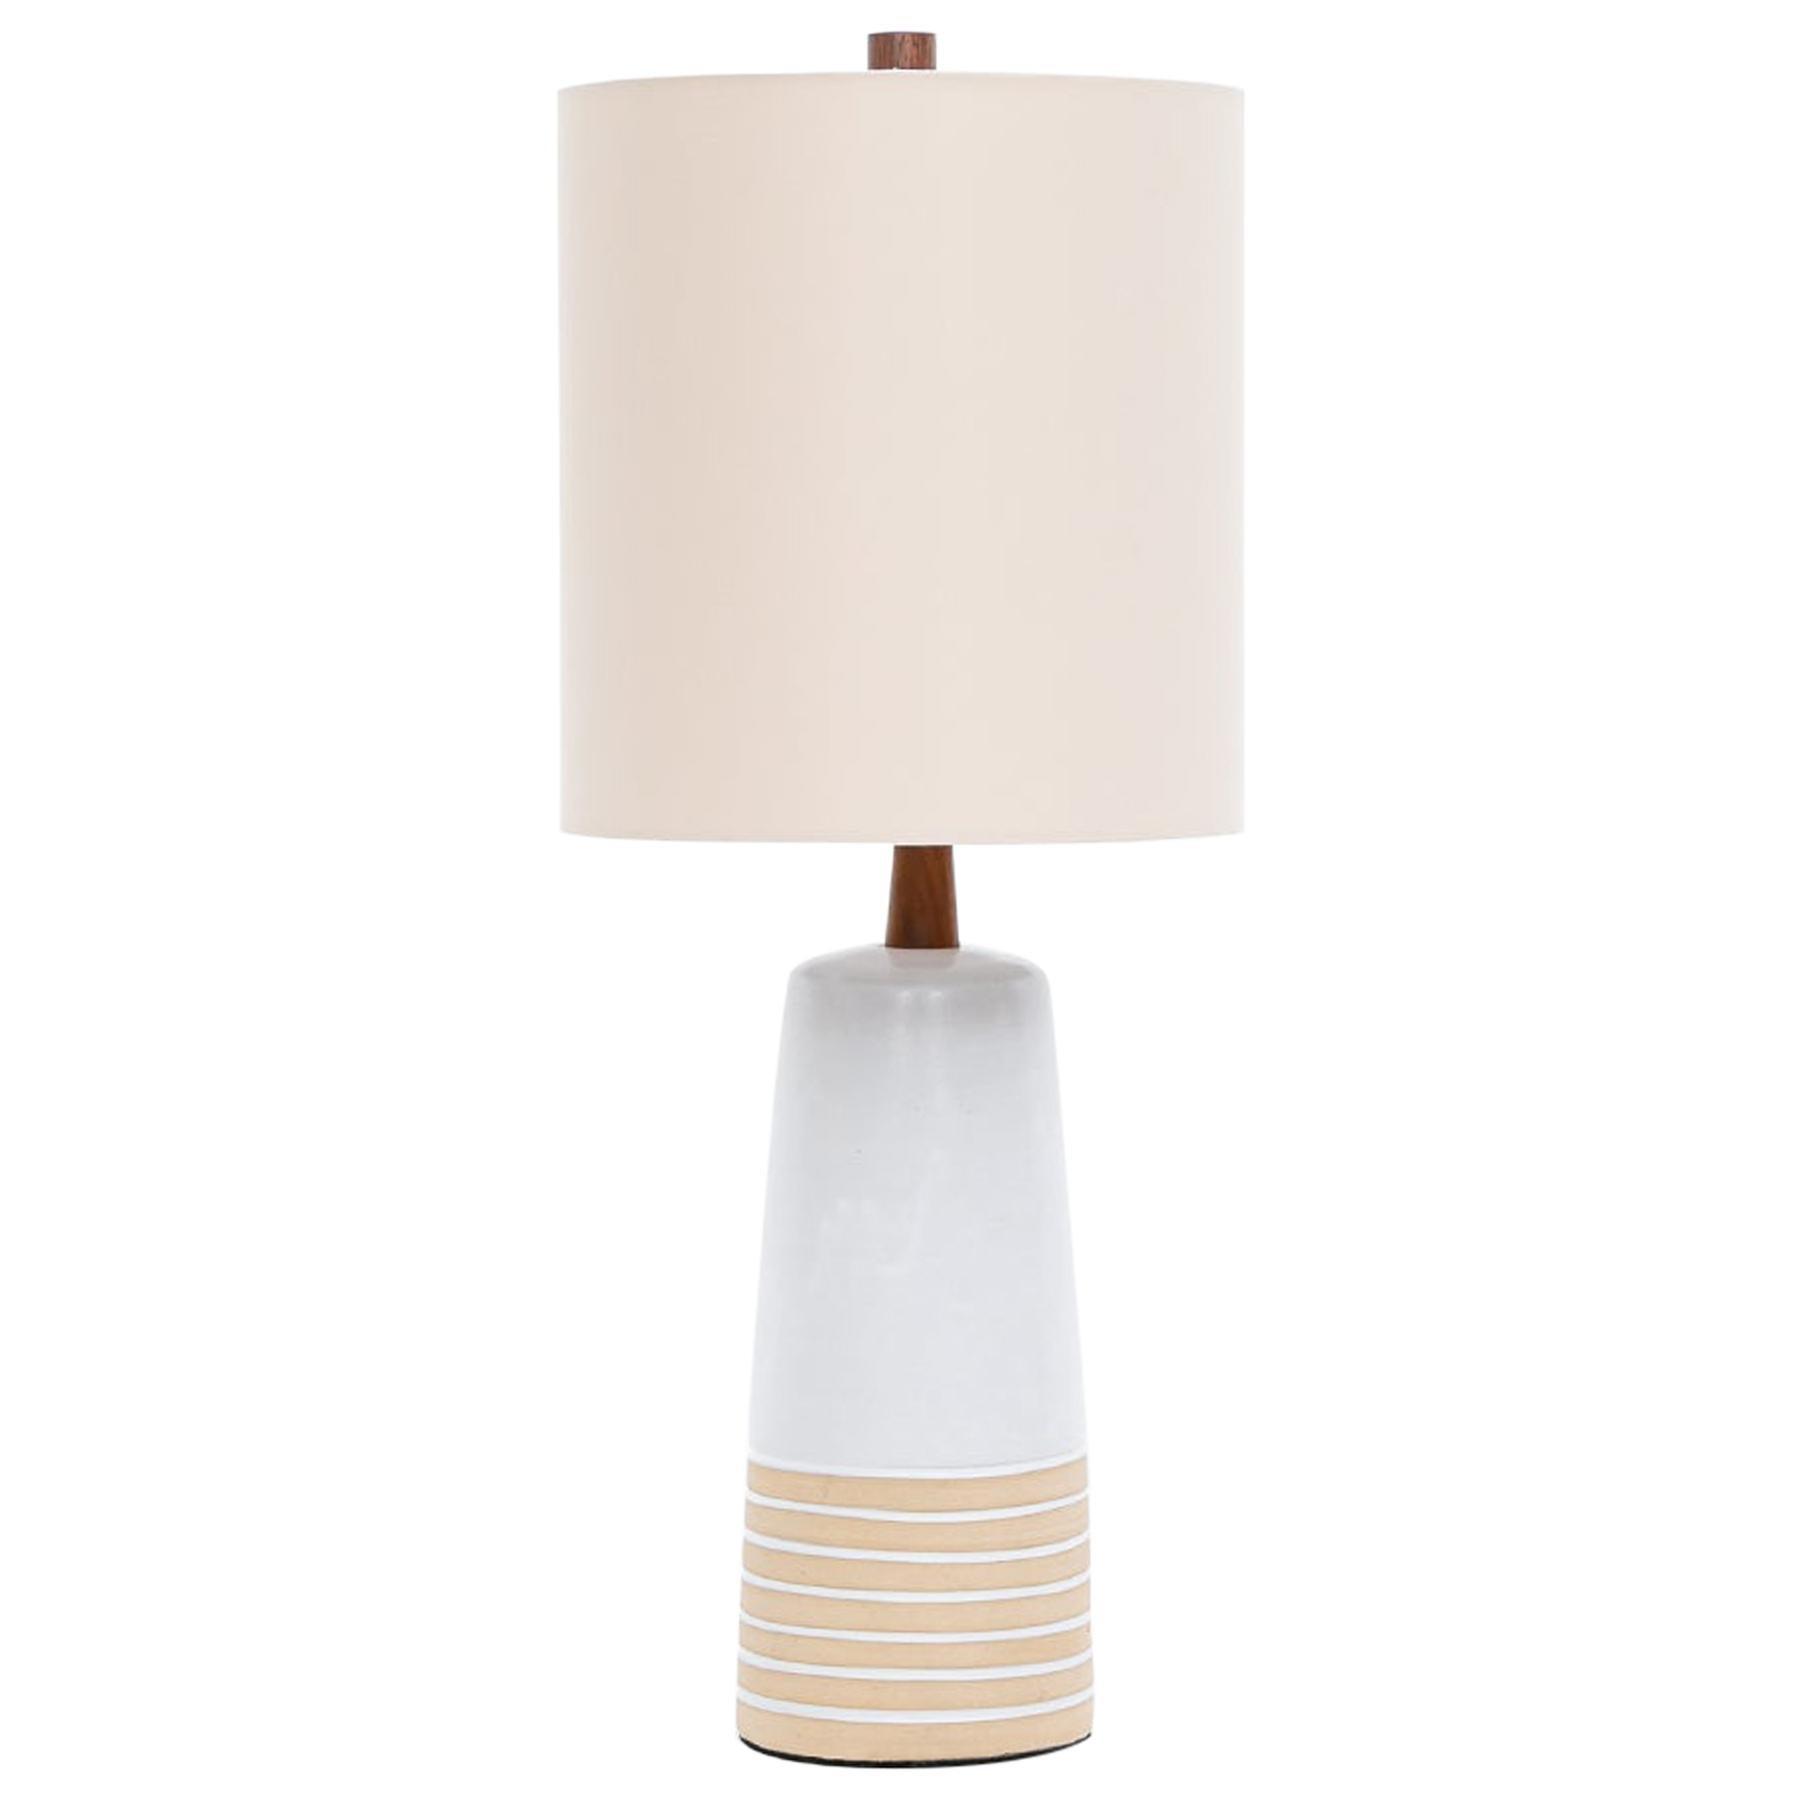 1950s Warm, Bright Ceramic Table Lamp by Jane & Gordon Martz 'j'